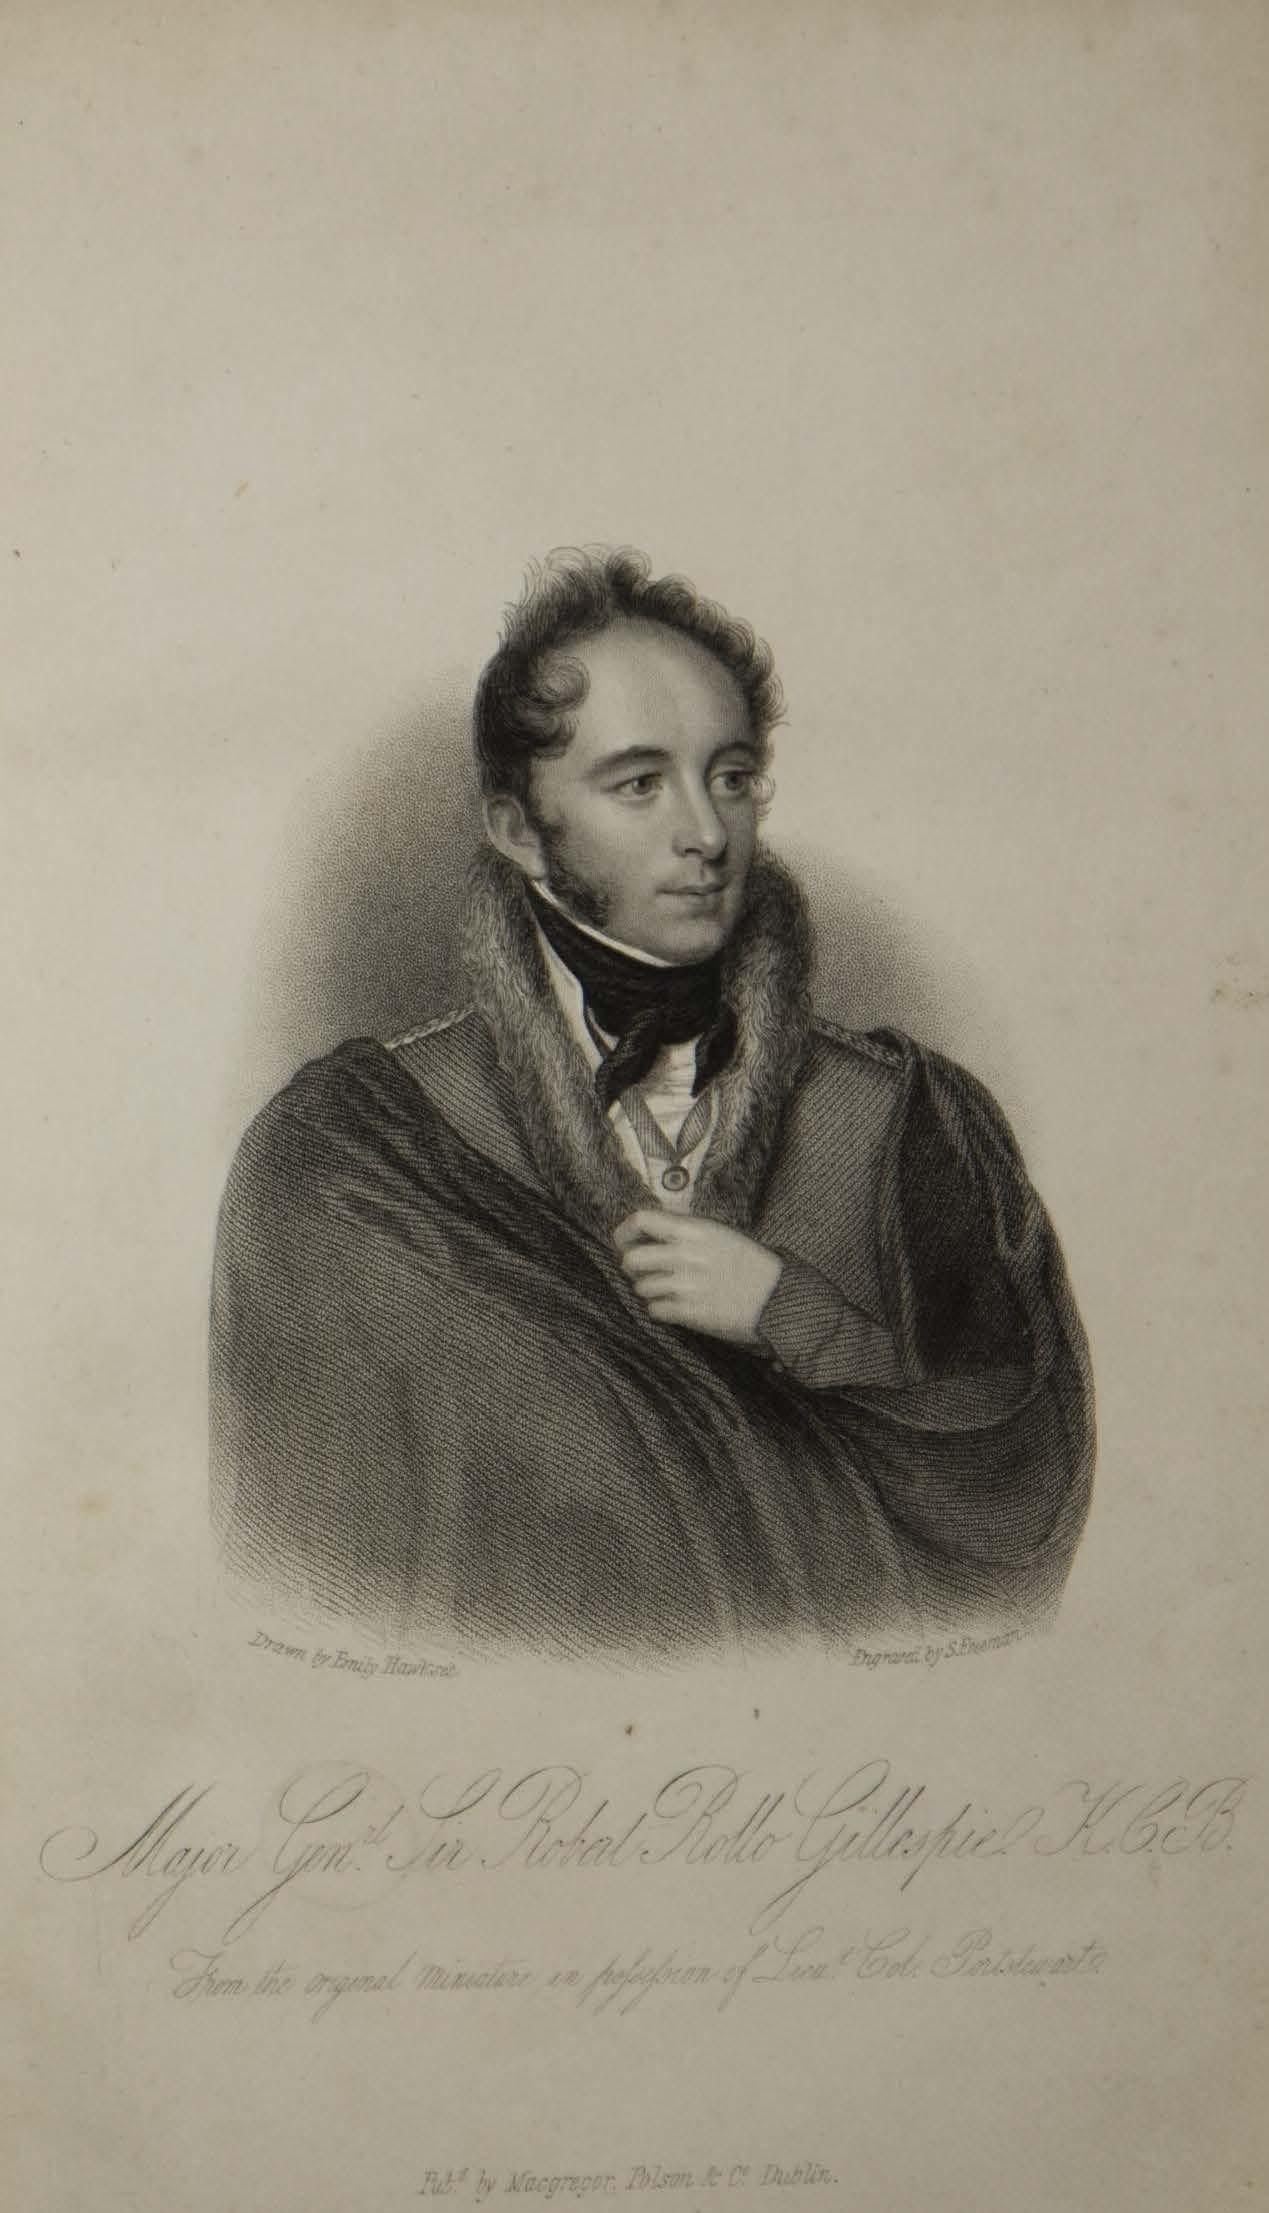 photo of The Lives of Illustrious Irishmen, Vol VI Part I 1845